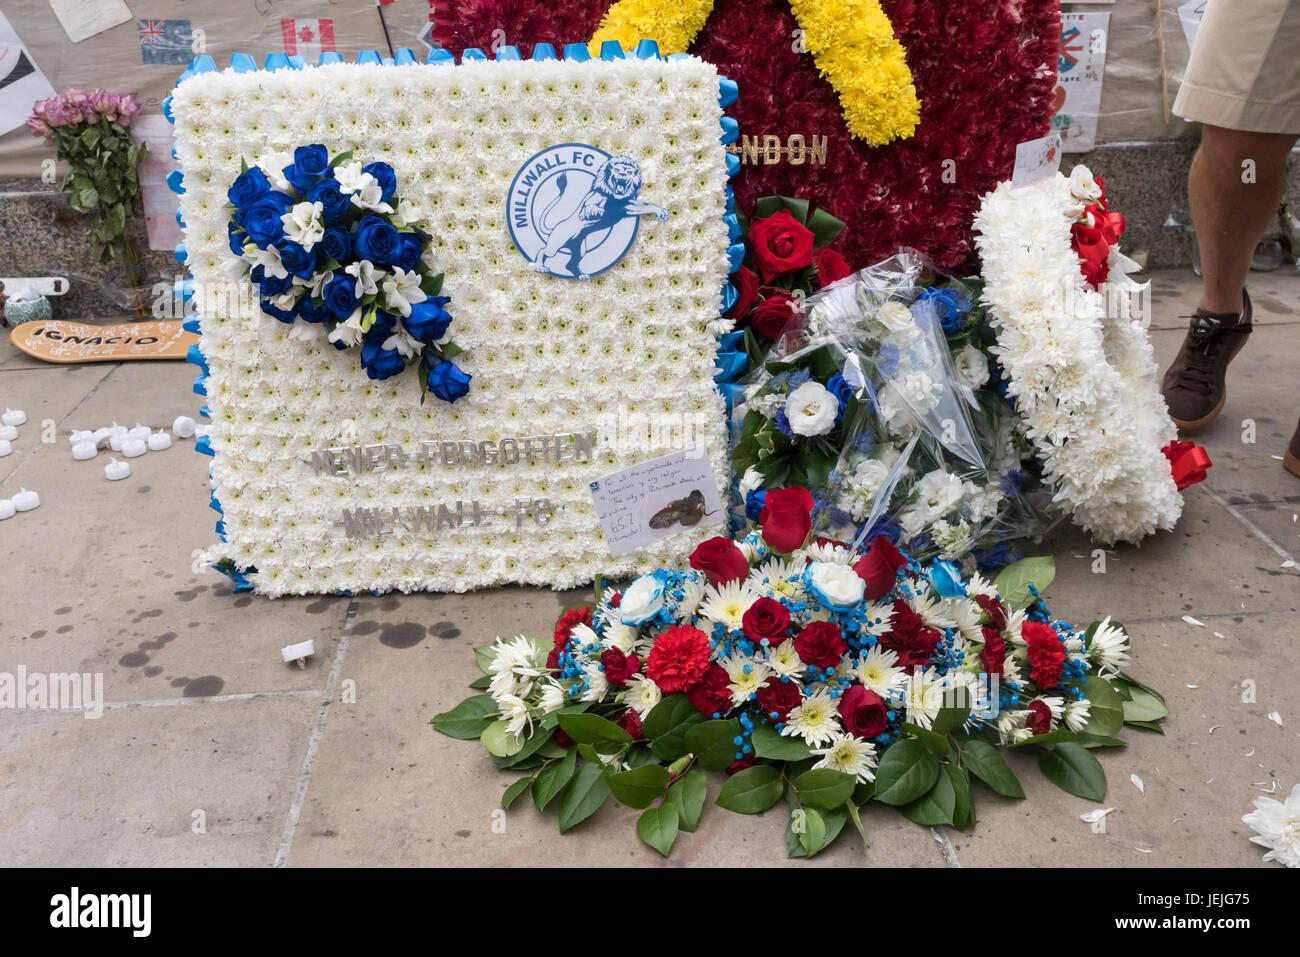 June 24 2017 london uk london uk 24th september 2017 june 24 2017 london uk london uk 24th september 2017 wreaths and flowers from fans of millwall west ham portsmouth and arsenal on london bridge izmirmasajfo